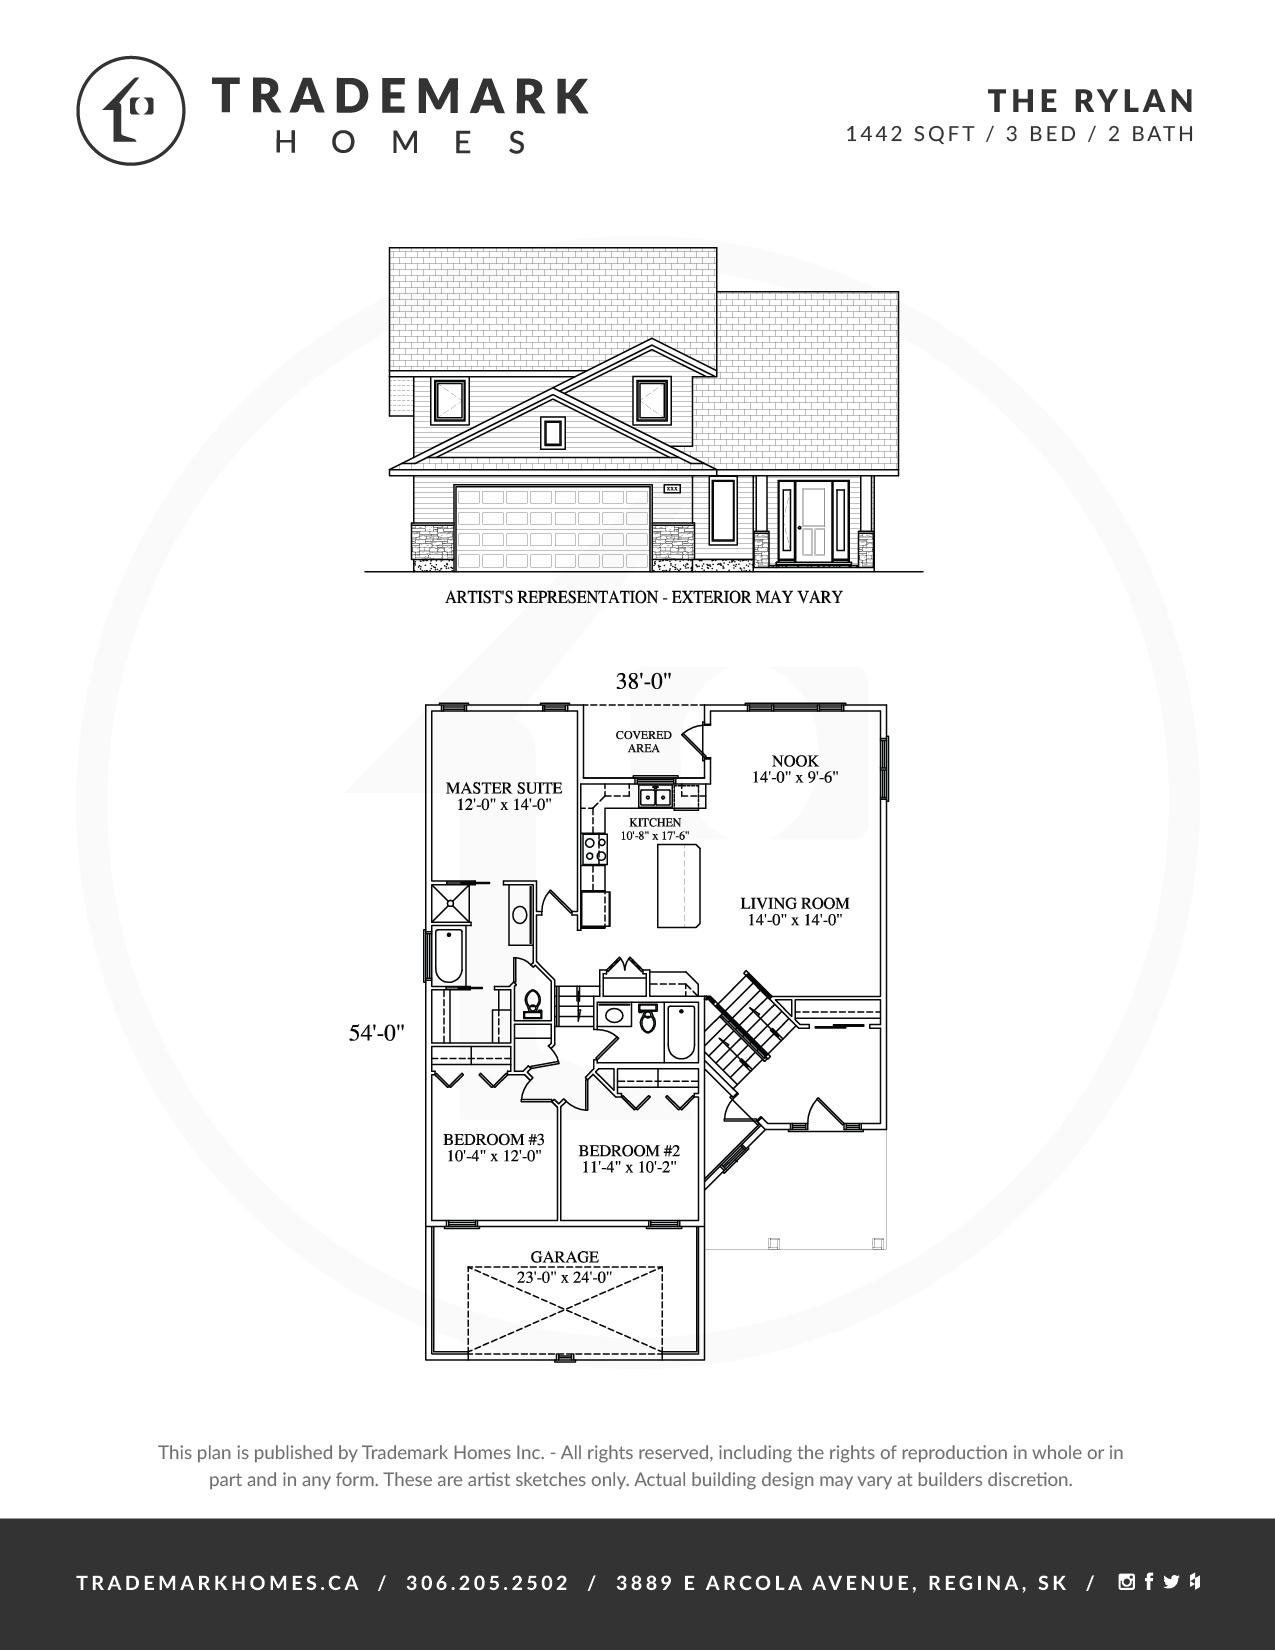 Trademark Homes The Rylan Bi-Level